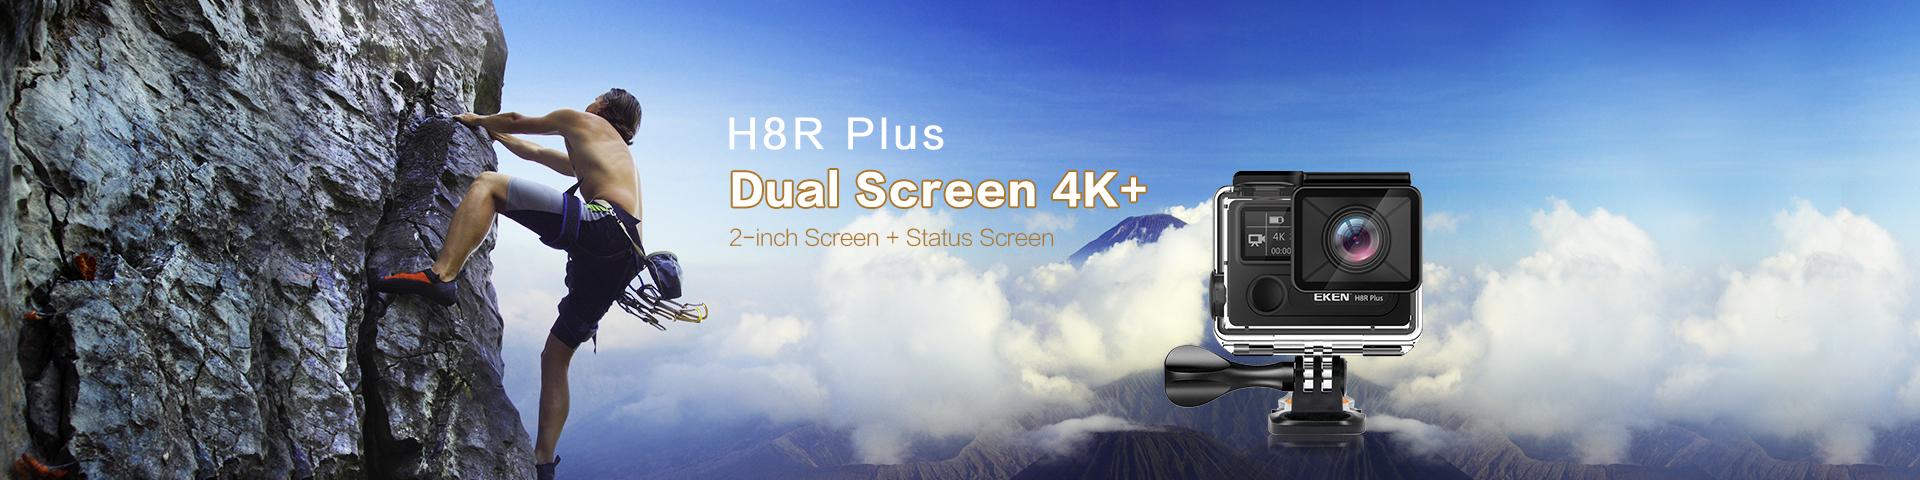 H8R Plus action camera